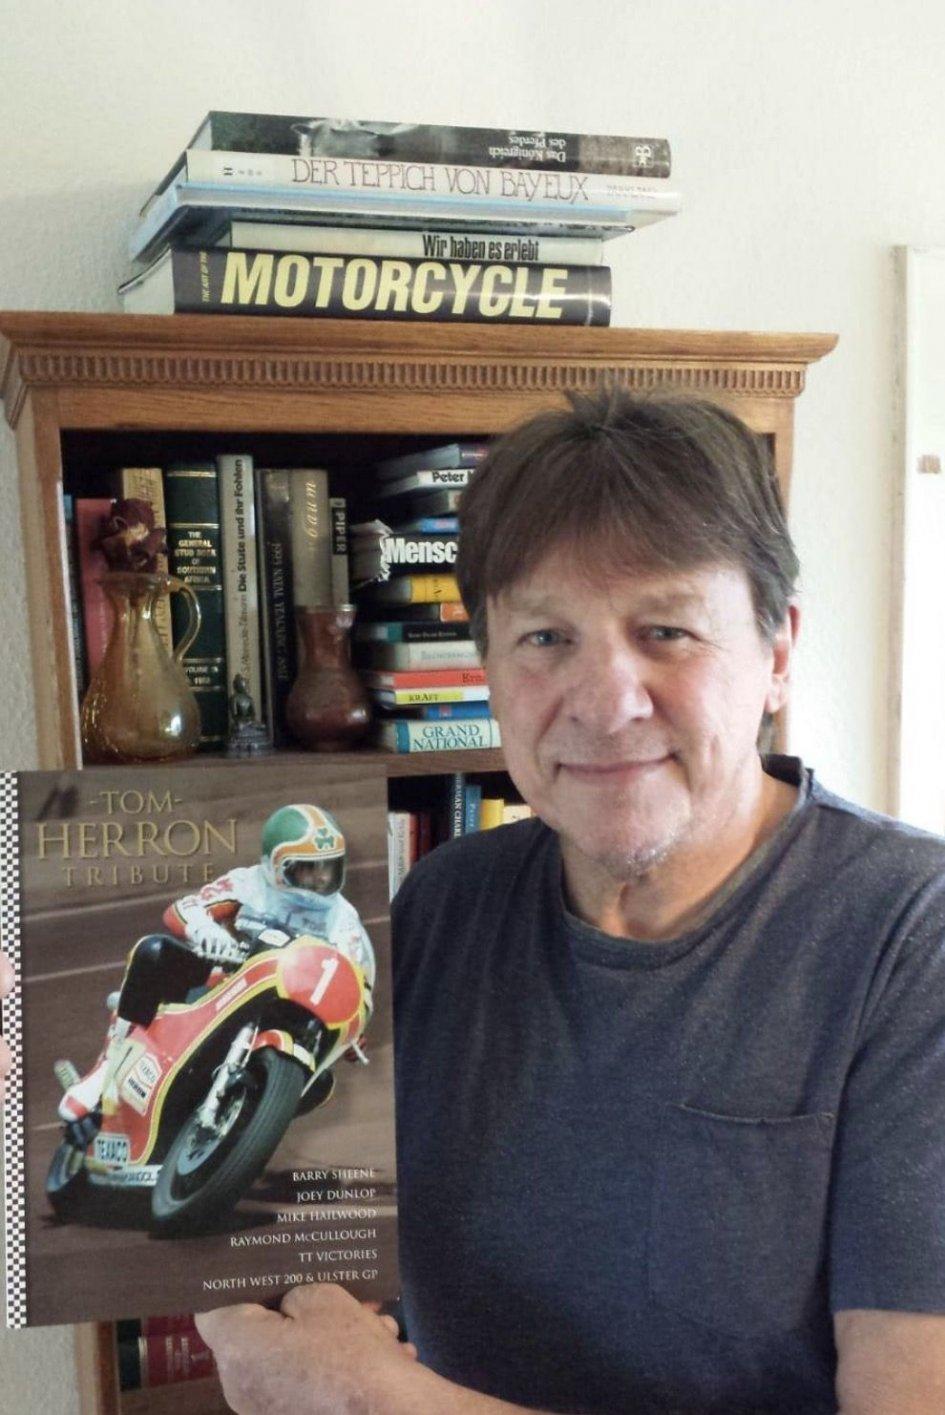 News: Tom Herron: an extraordinary man. The book